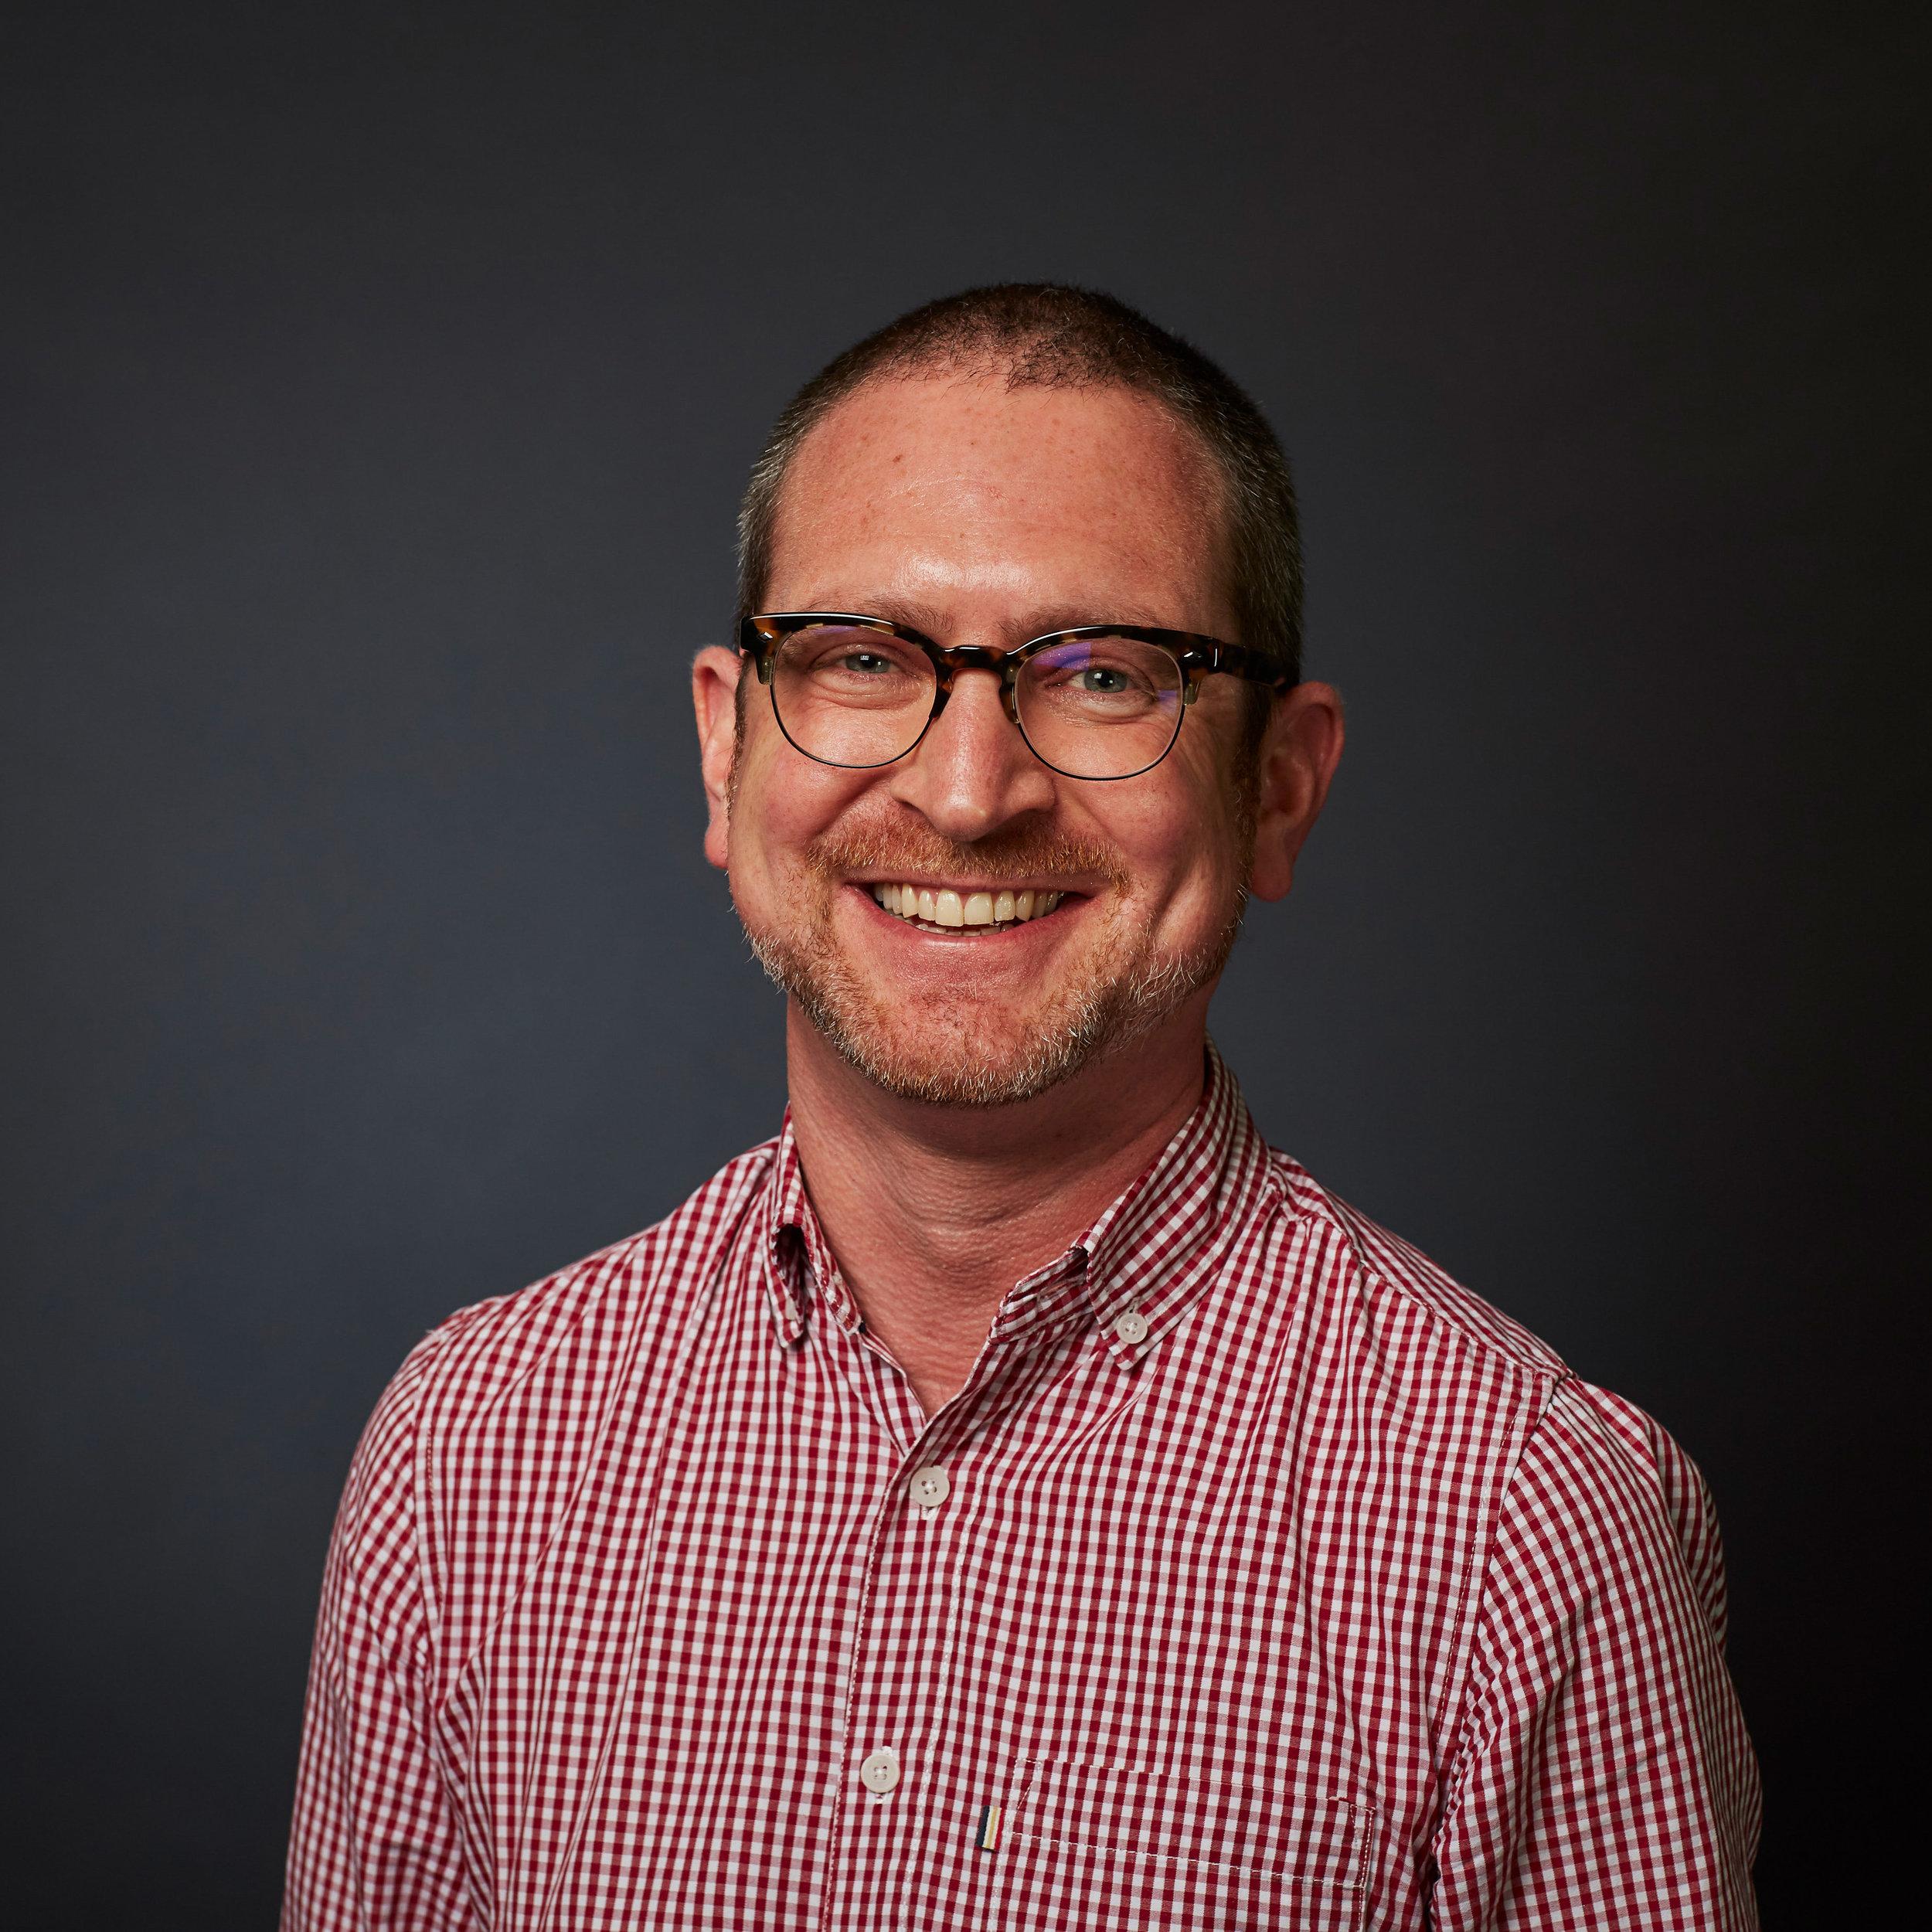 Professor Martin Holt